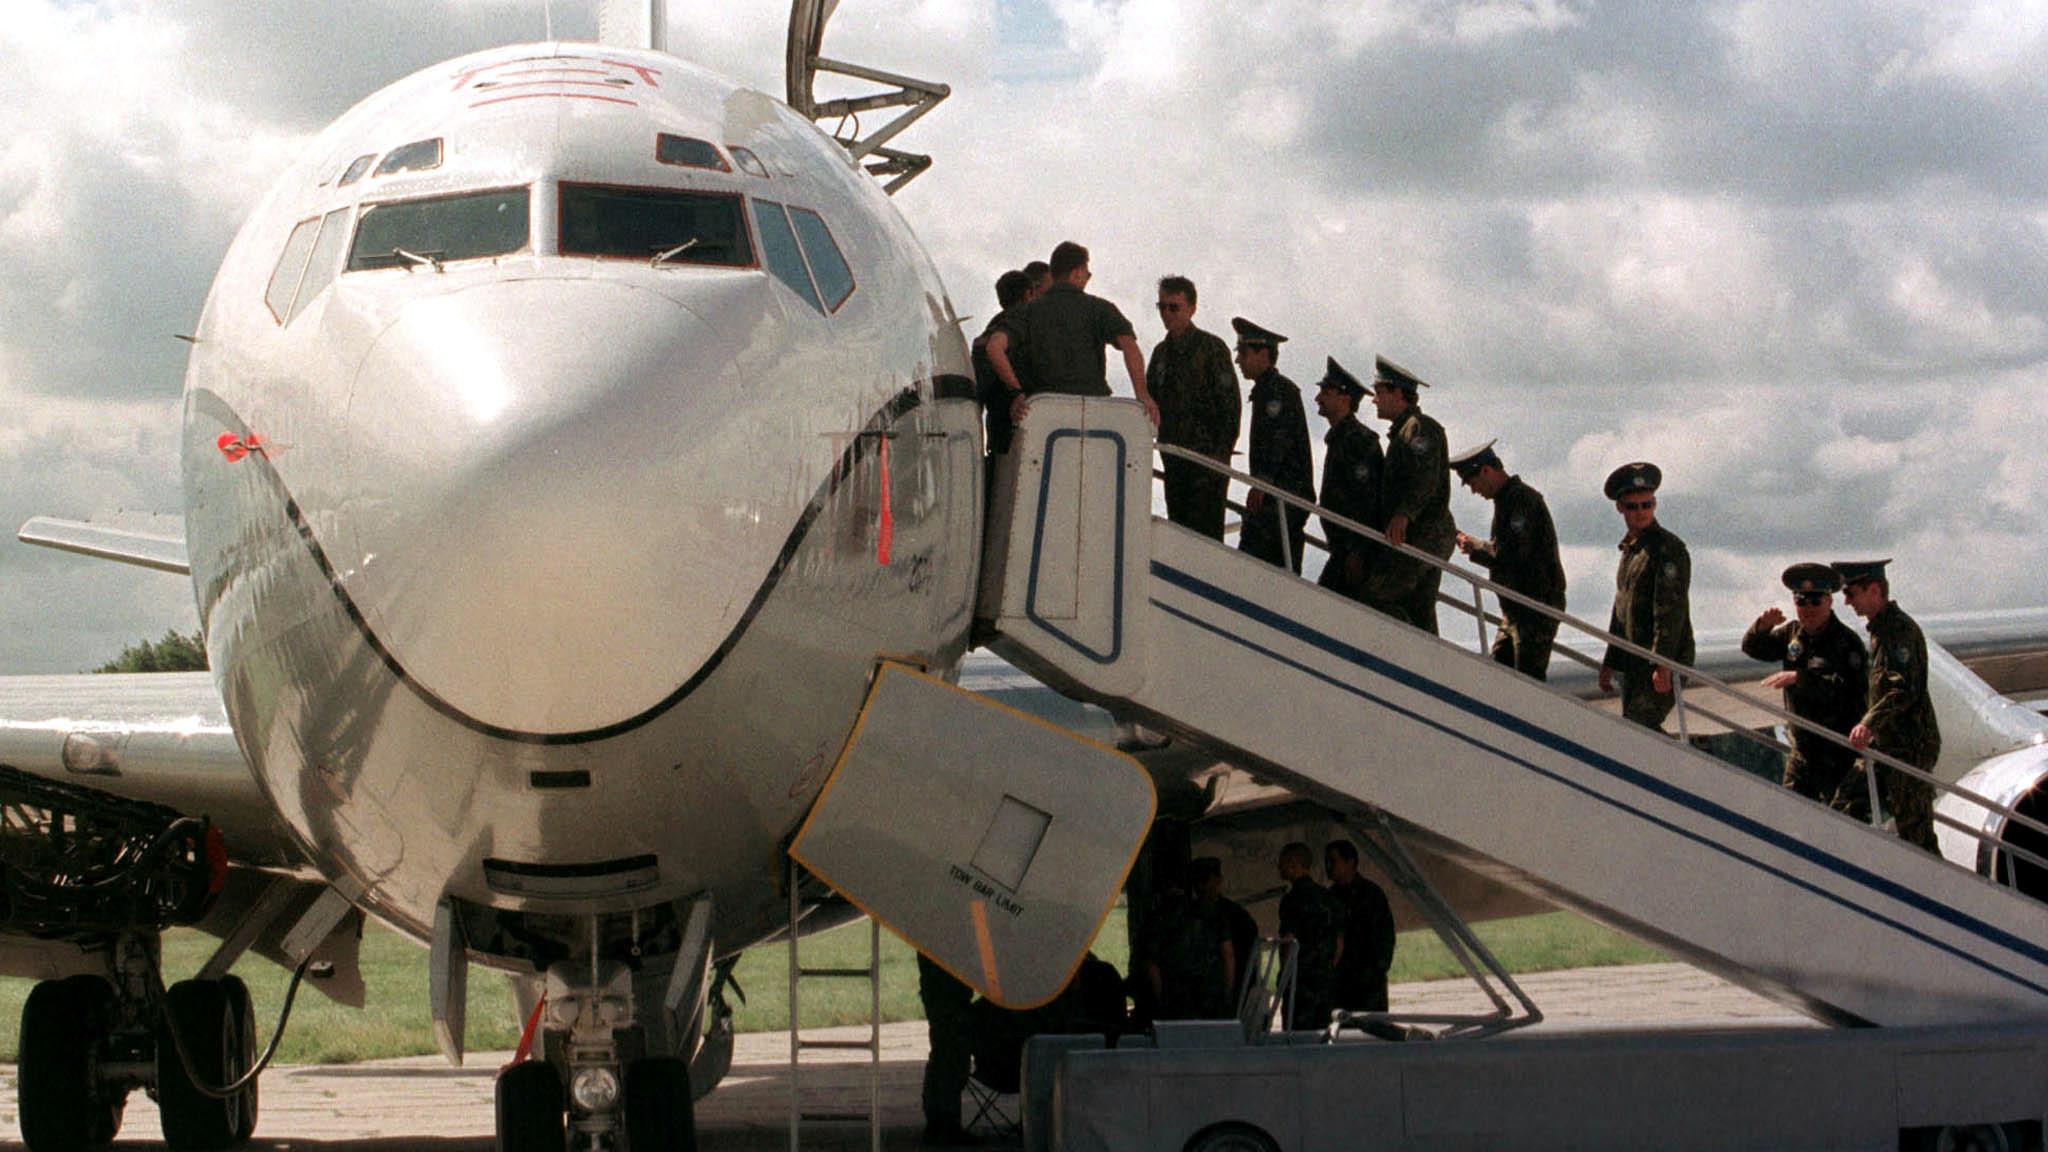 UKRAINIAN OFFICERS ENTER THE U.S. OBSERVATION AIRCRAFT IN KIEV.